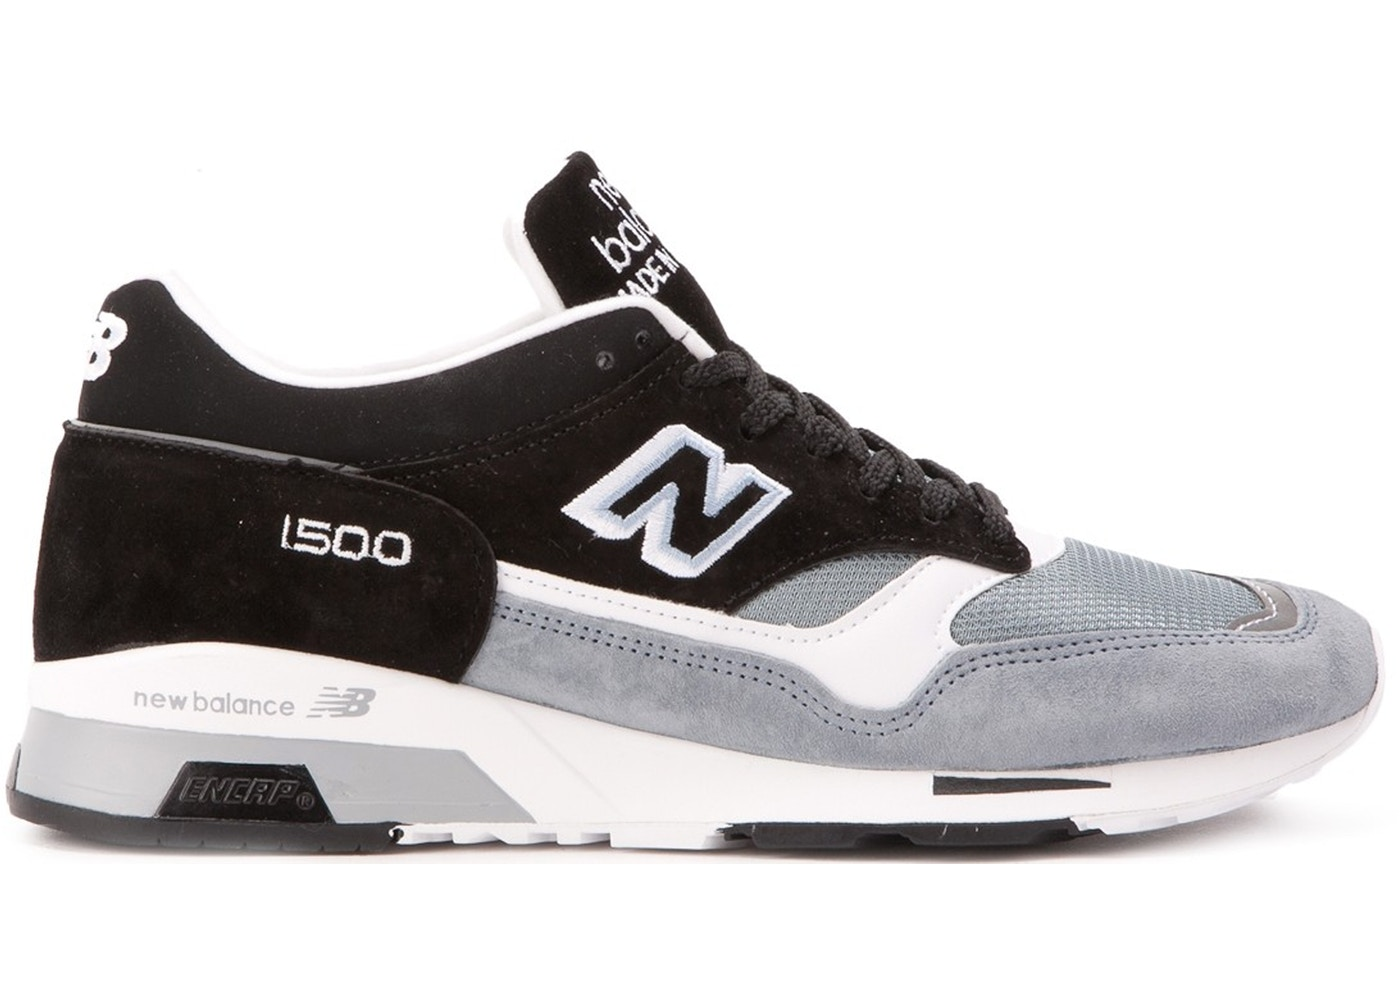 buy online 5c6c1 98255 New Balance 1500 Black Dusty Blue - M1500PSK